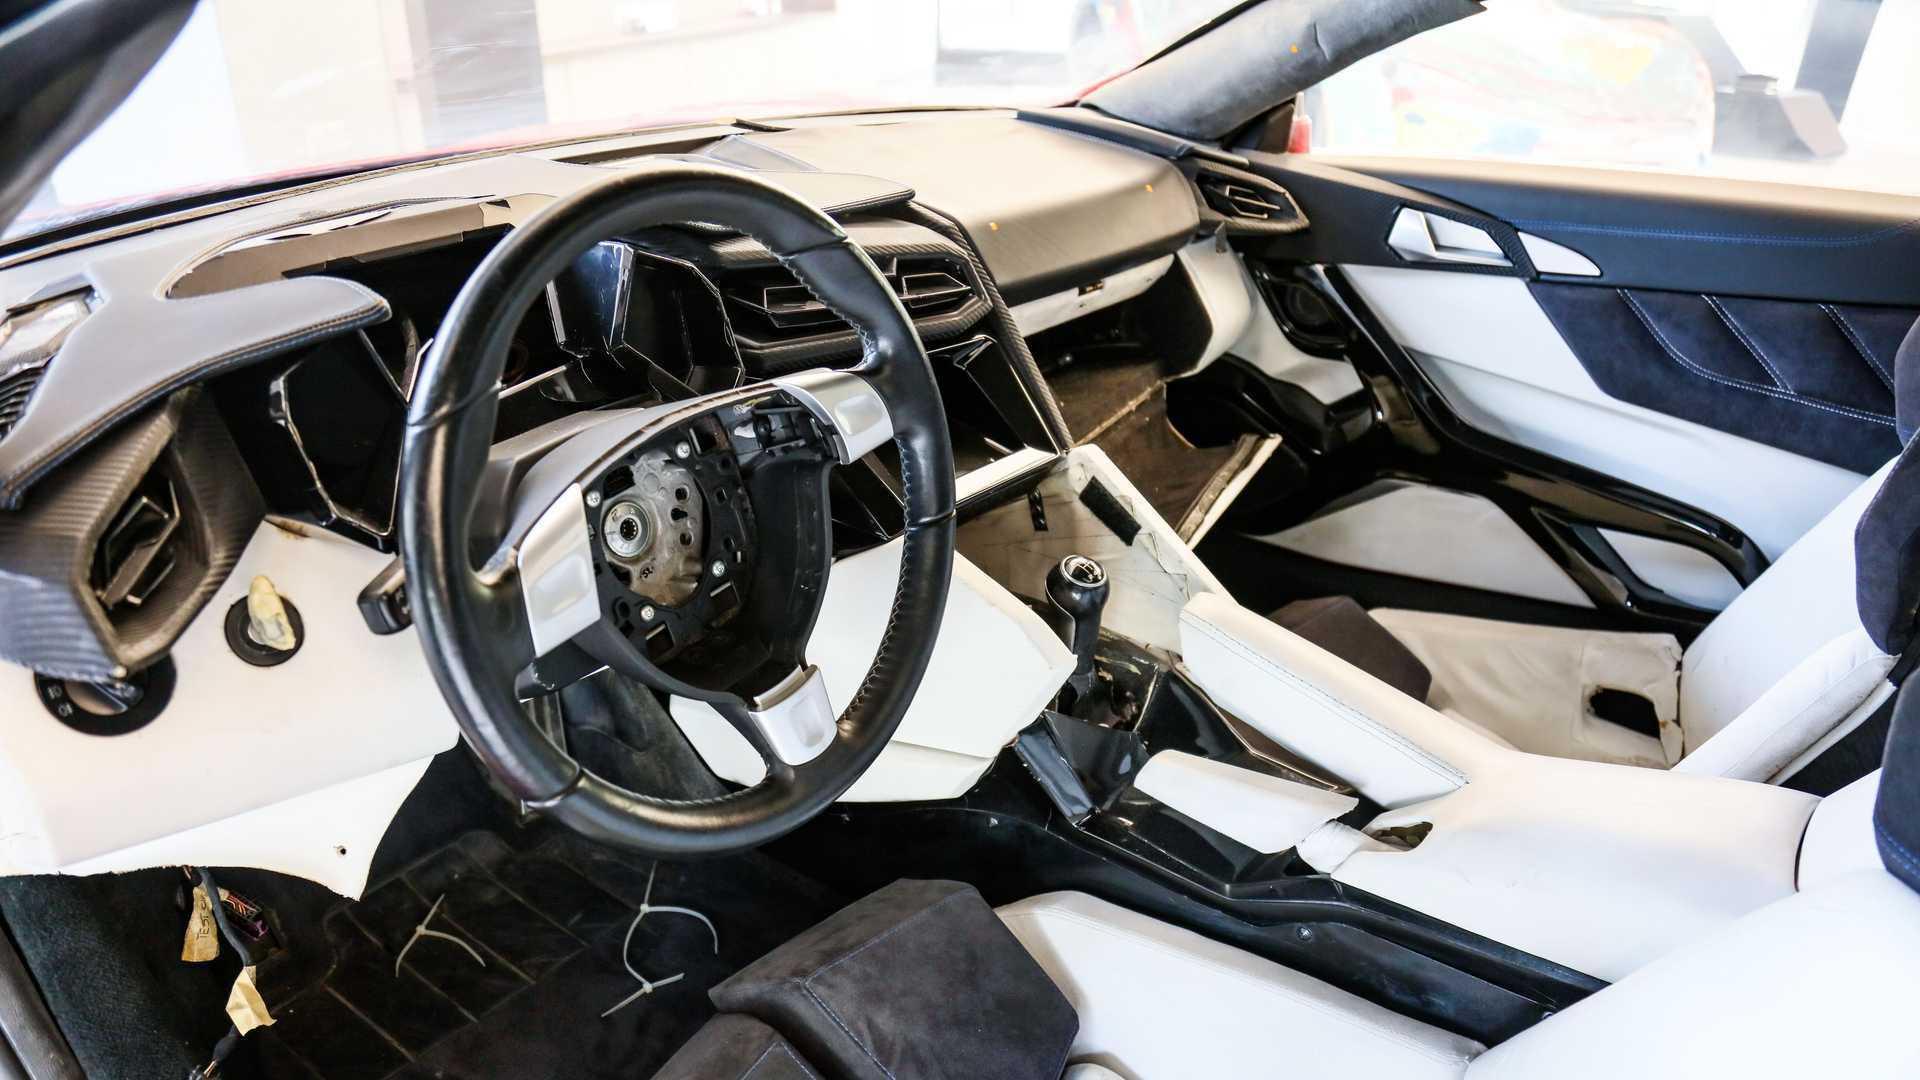 Lykan_HyperSport_stunt_car_sale-0016